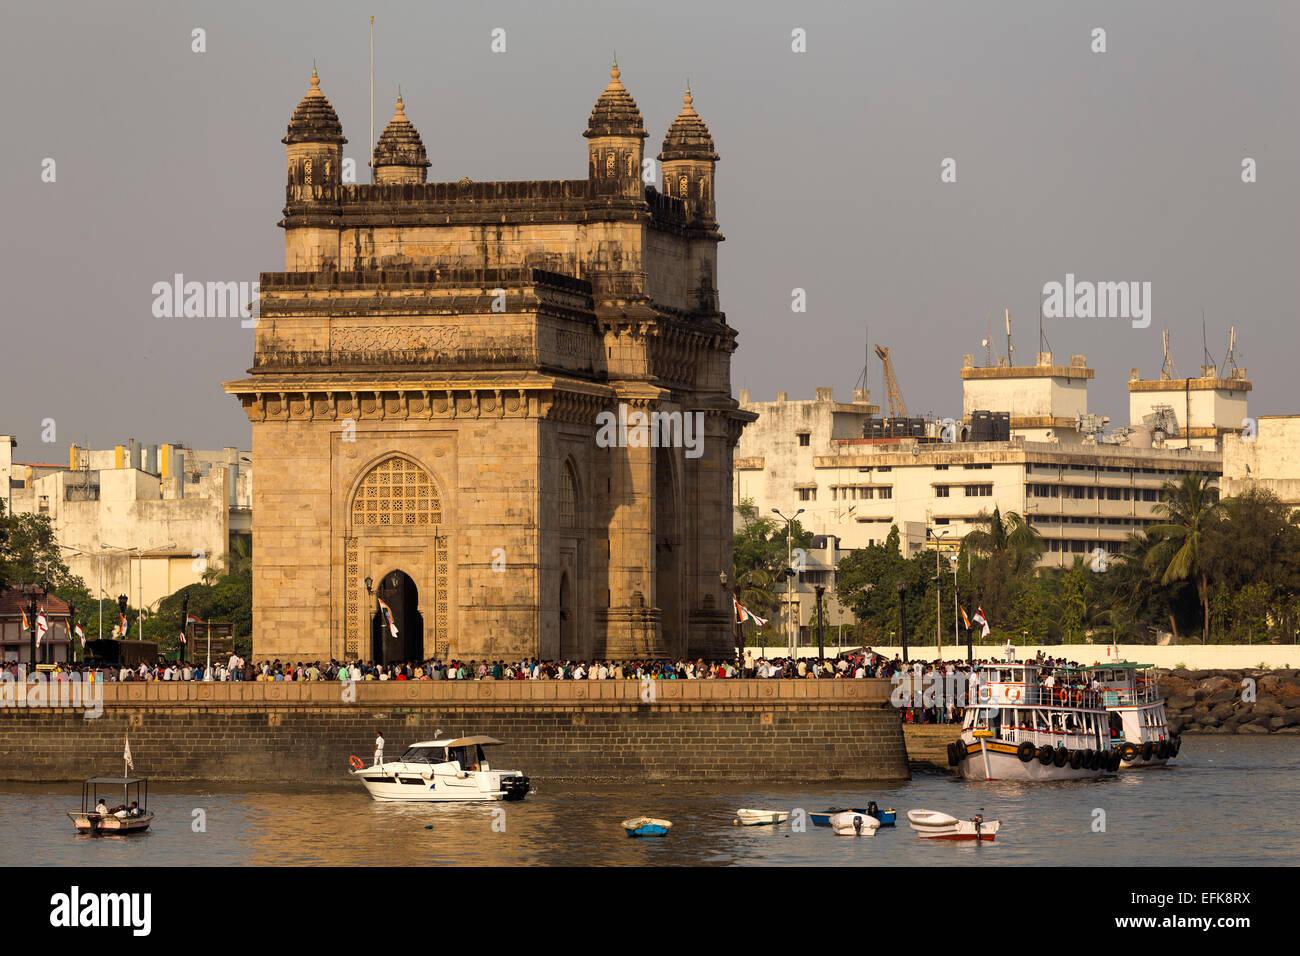 L'Inde, Maharashtra, Mumbai, porte de l'Inde et du port Photo Stock